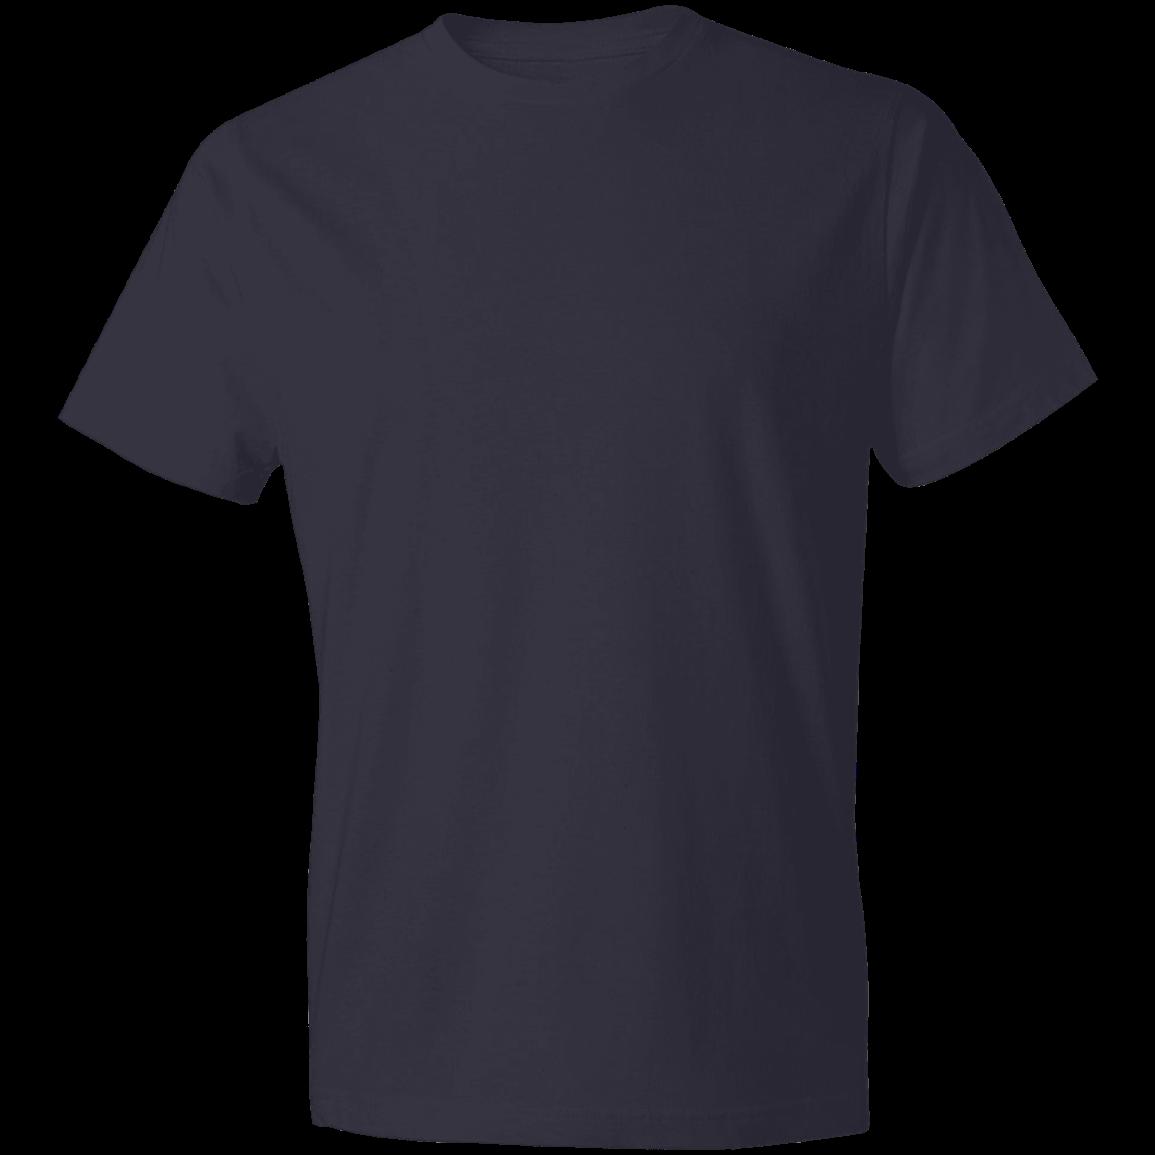 Anvil Lightweight Tshirt 45 Oz